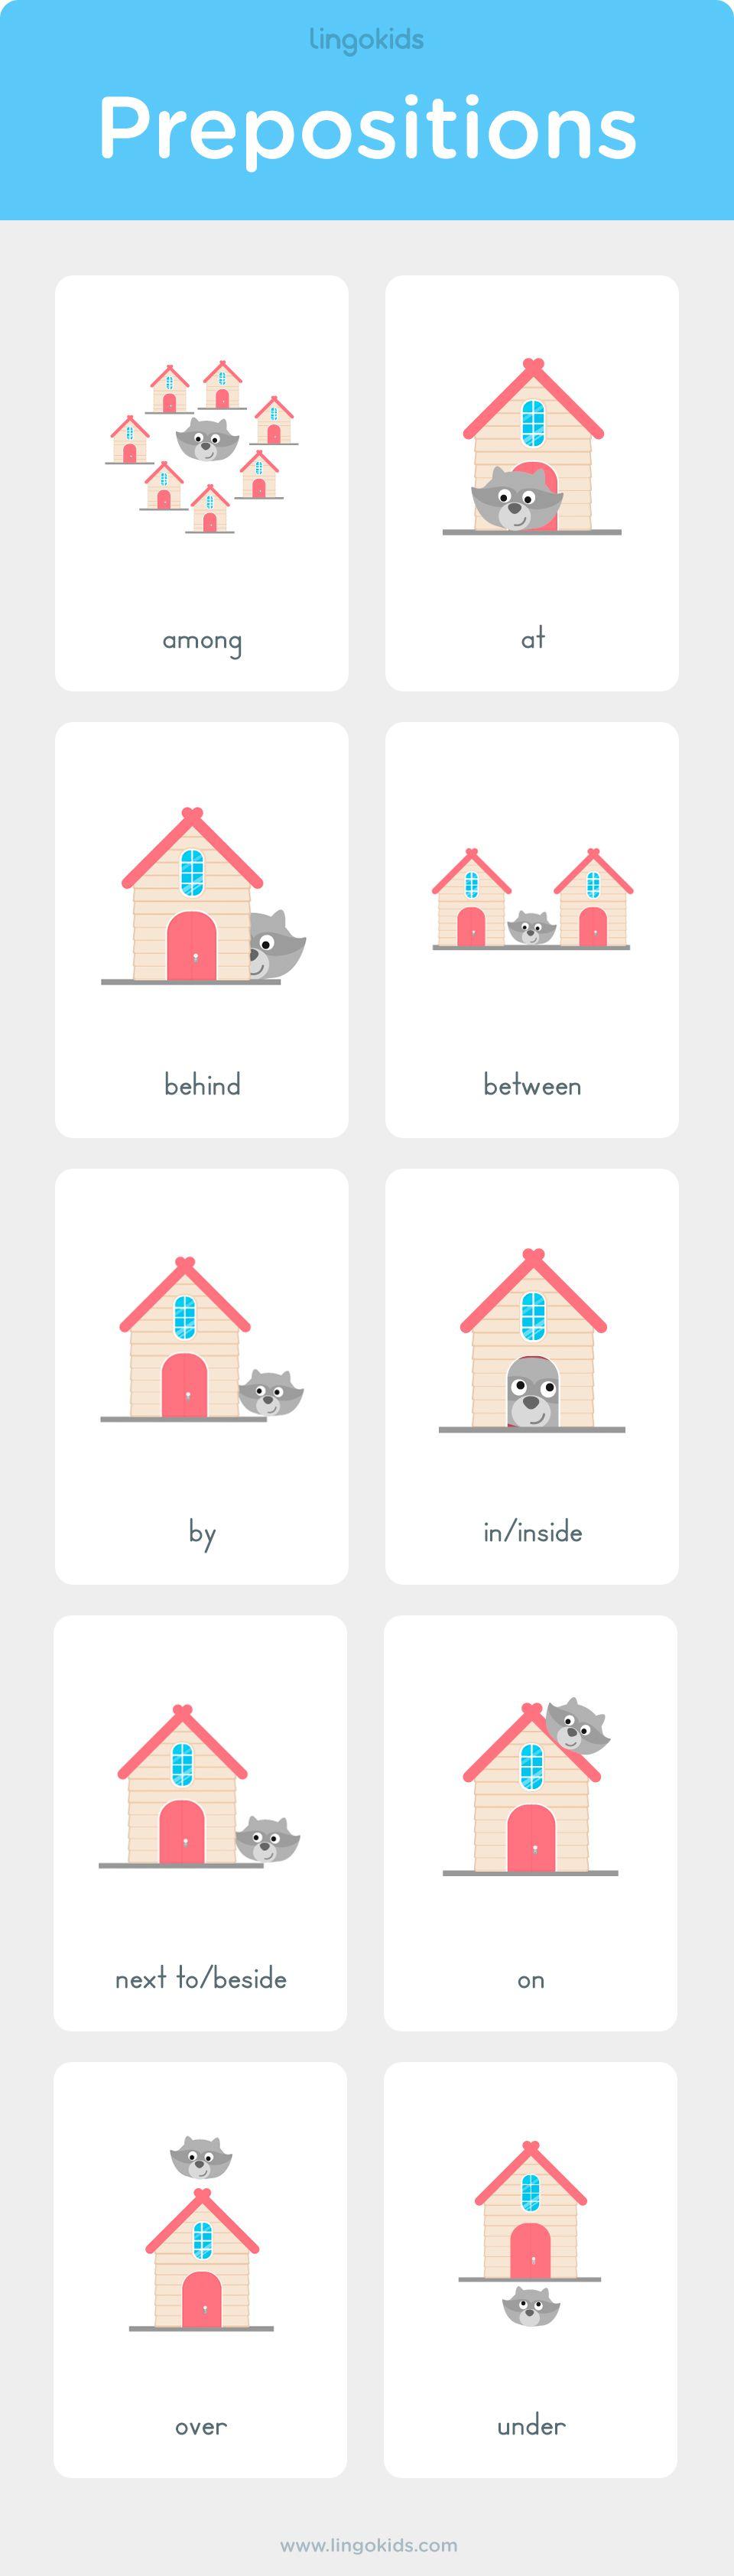 Prepositions In English Learning English For Kids Kids English Teaching English [ 3368 x 960 Pixel ]